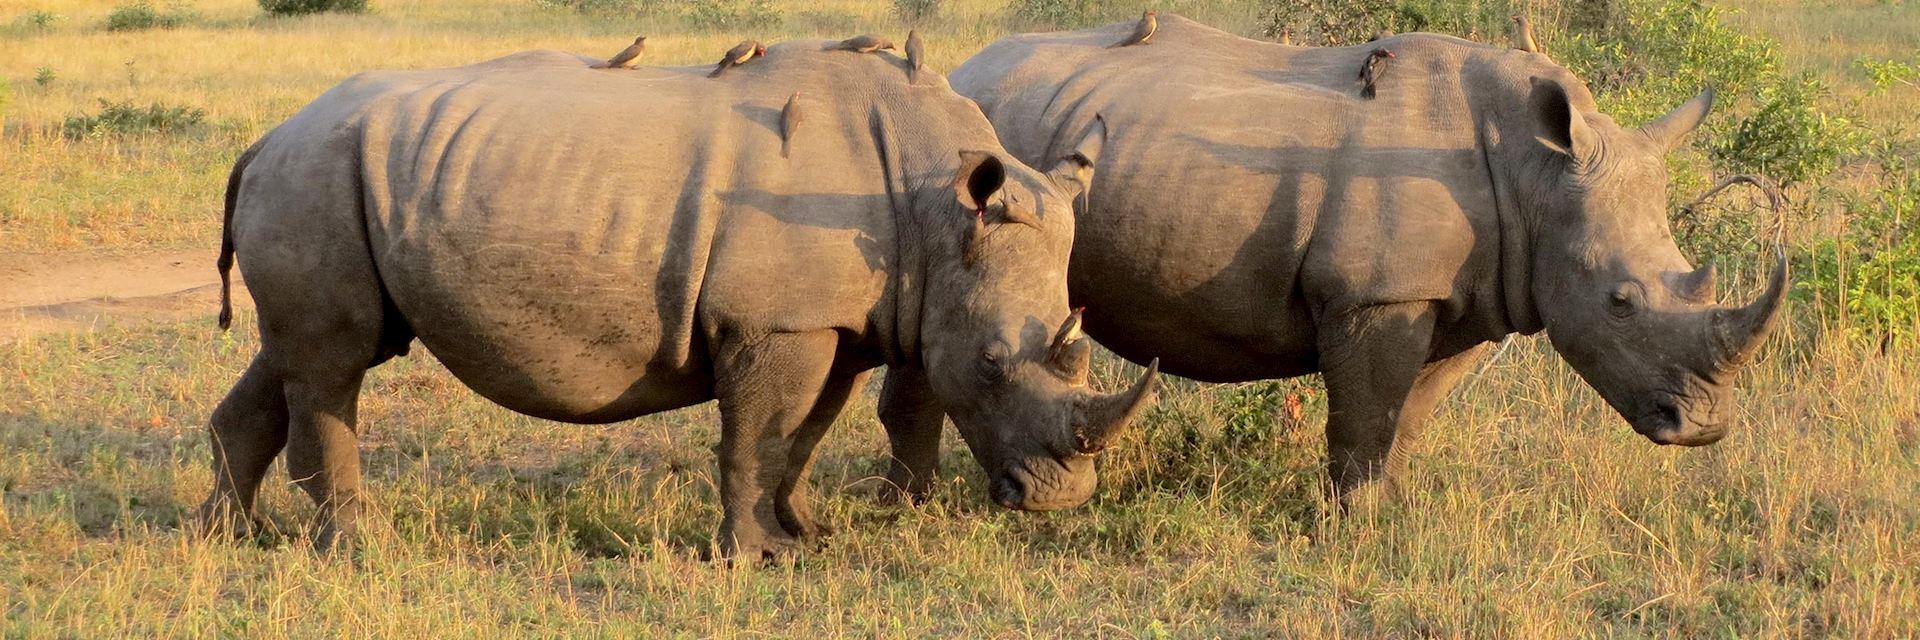 White rhino, Thornybush Reserve, South Africa